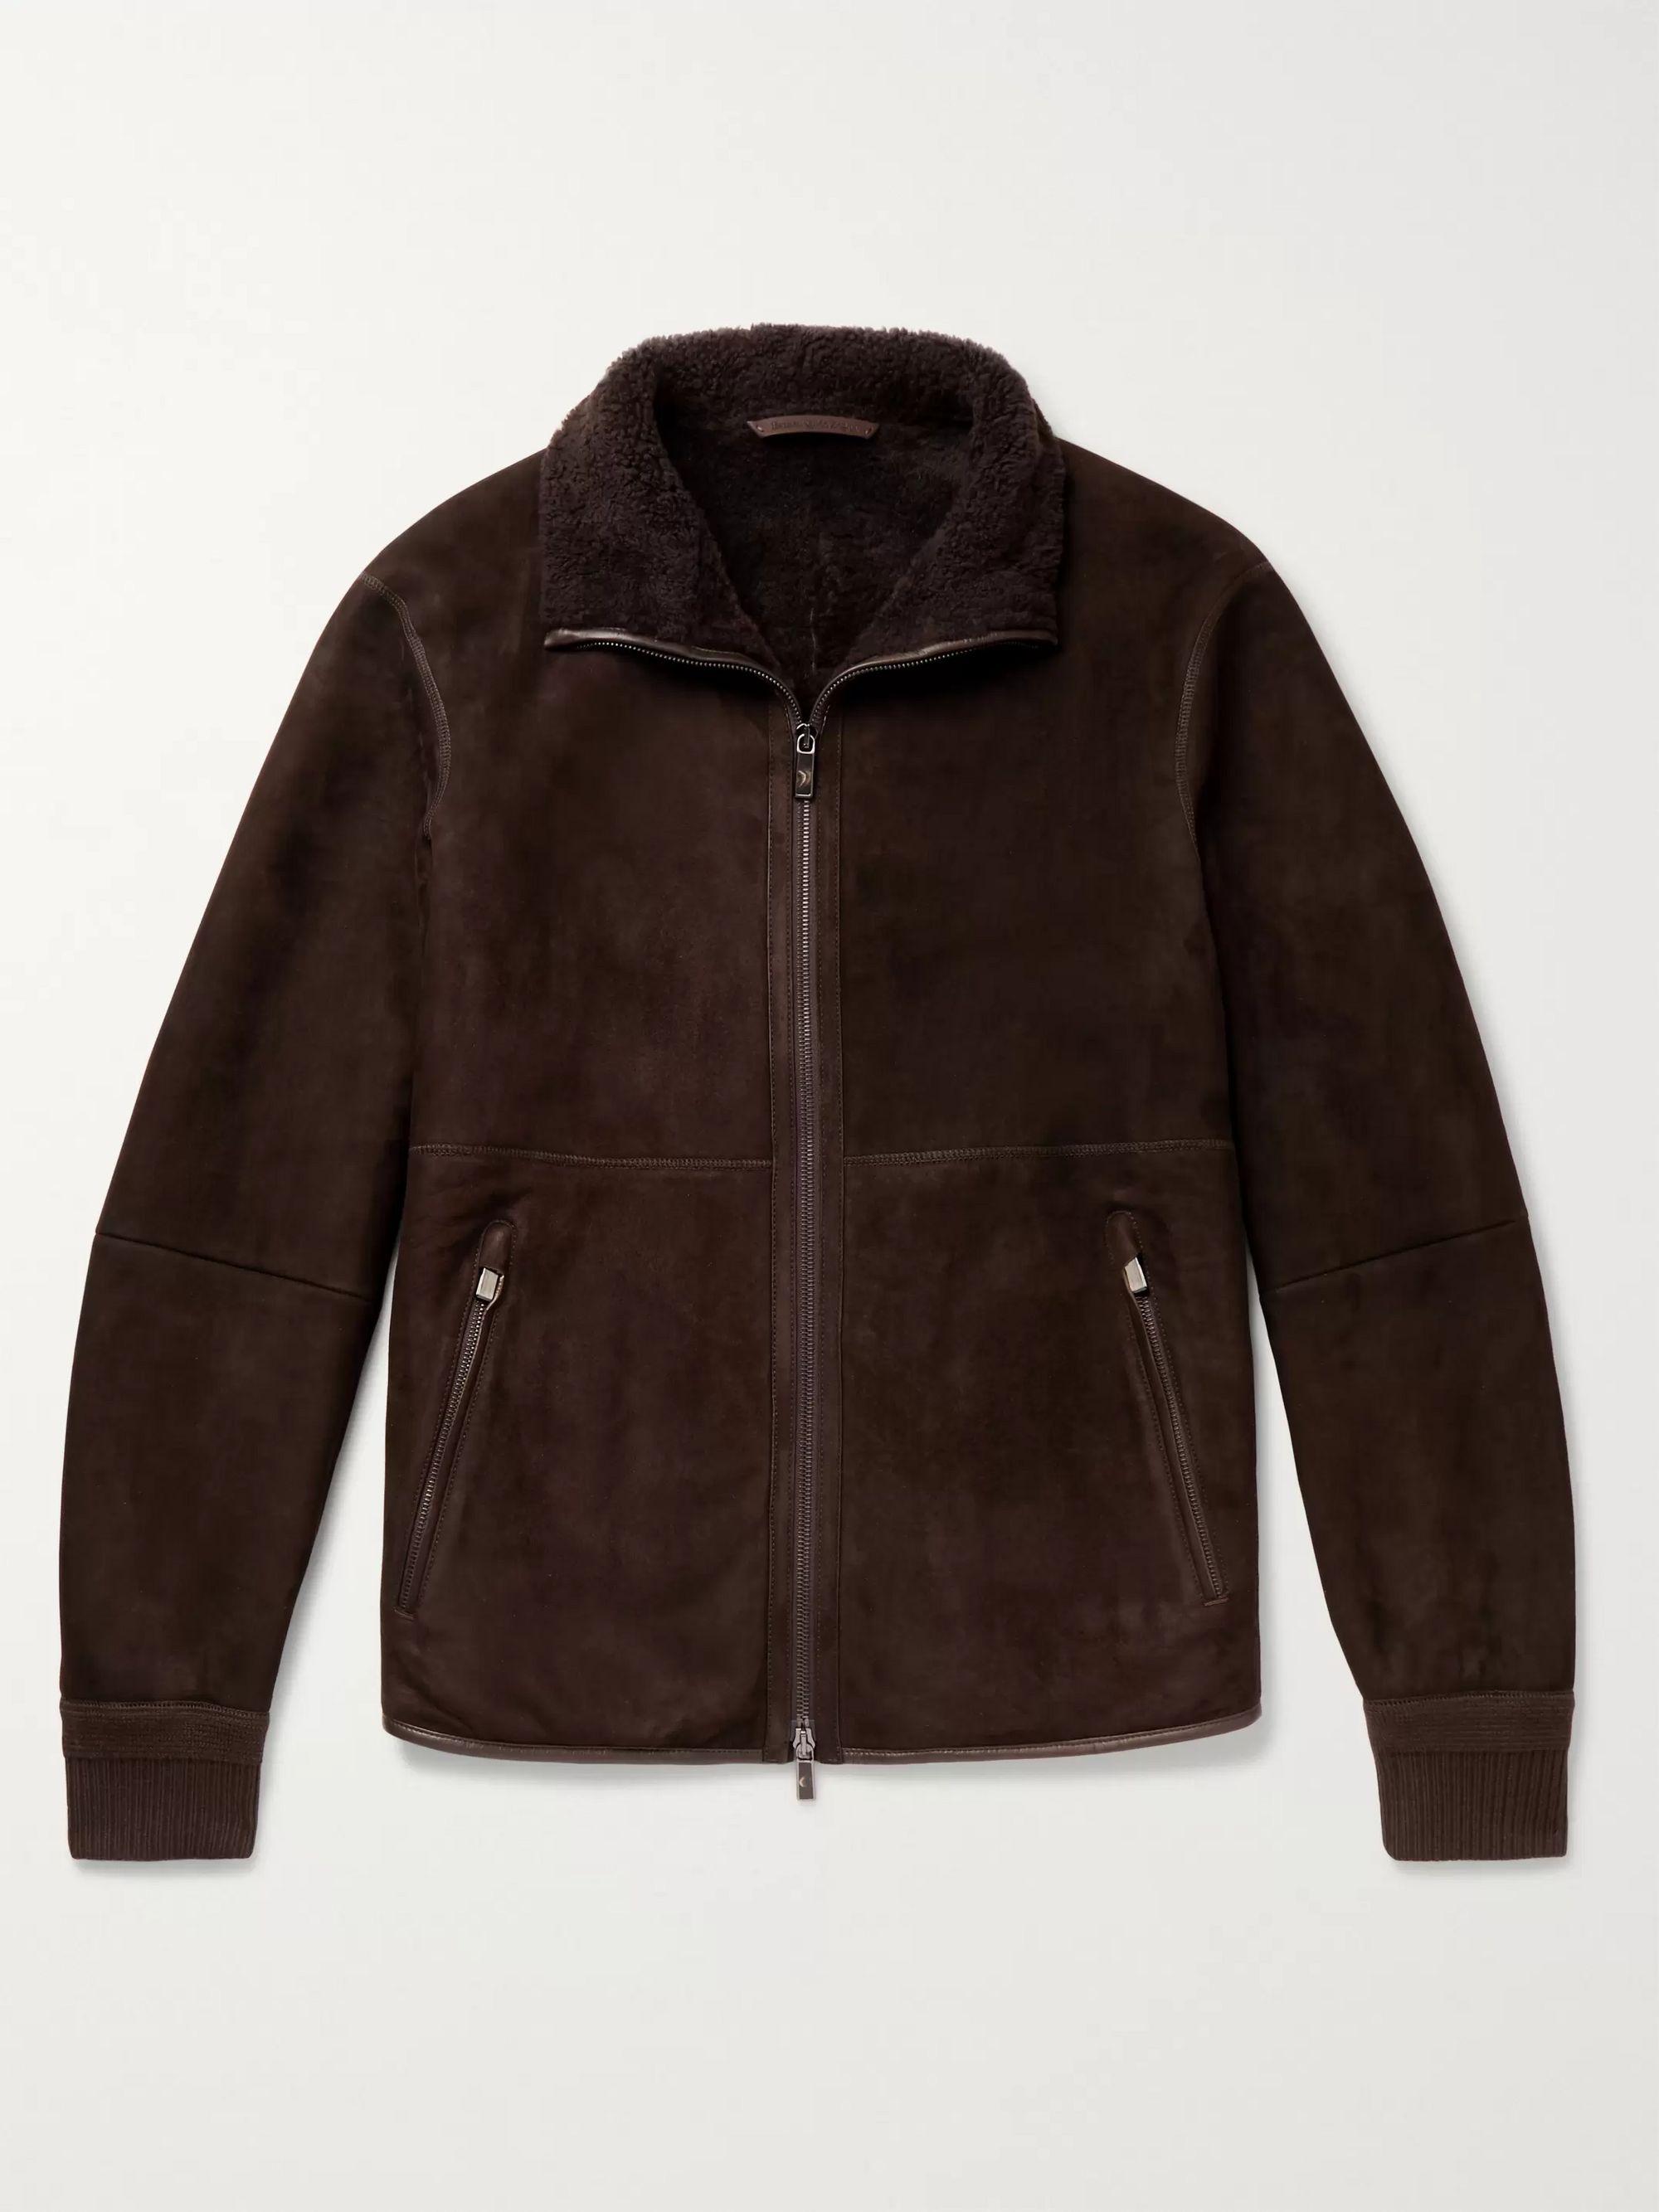 Shearling Blouson Jacket by Mr Porter